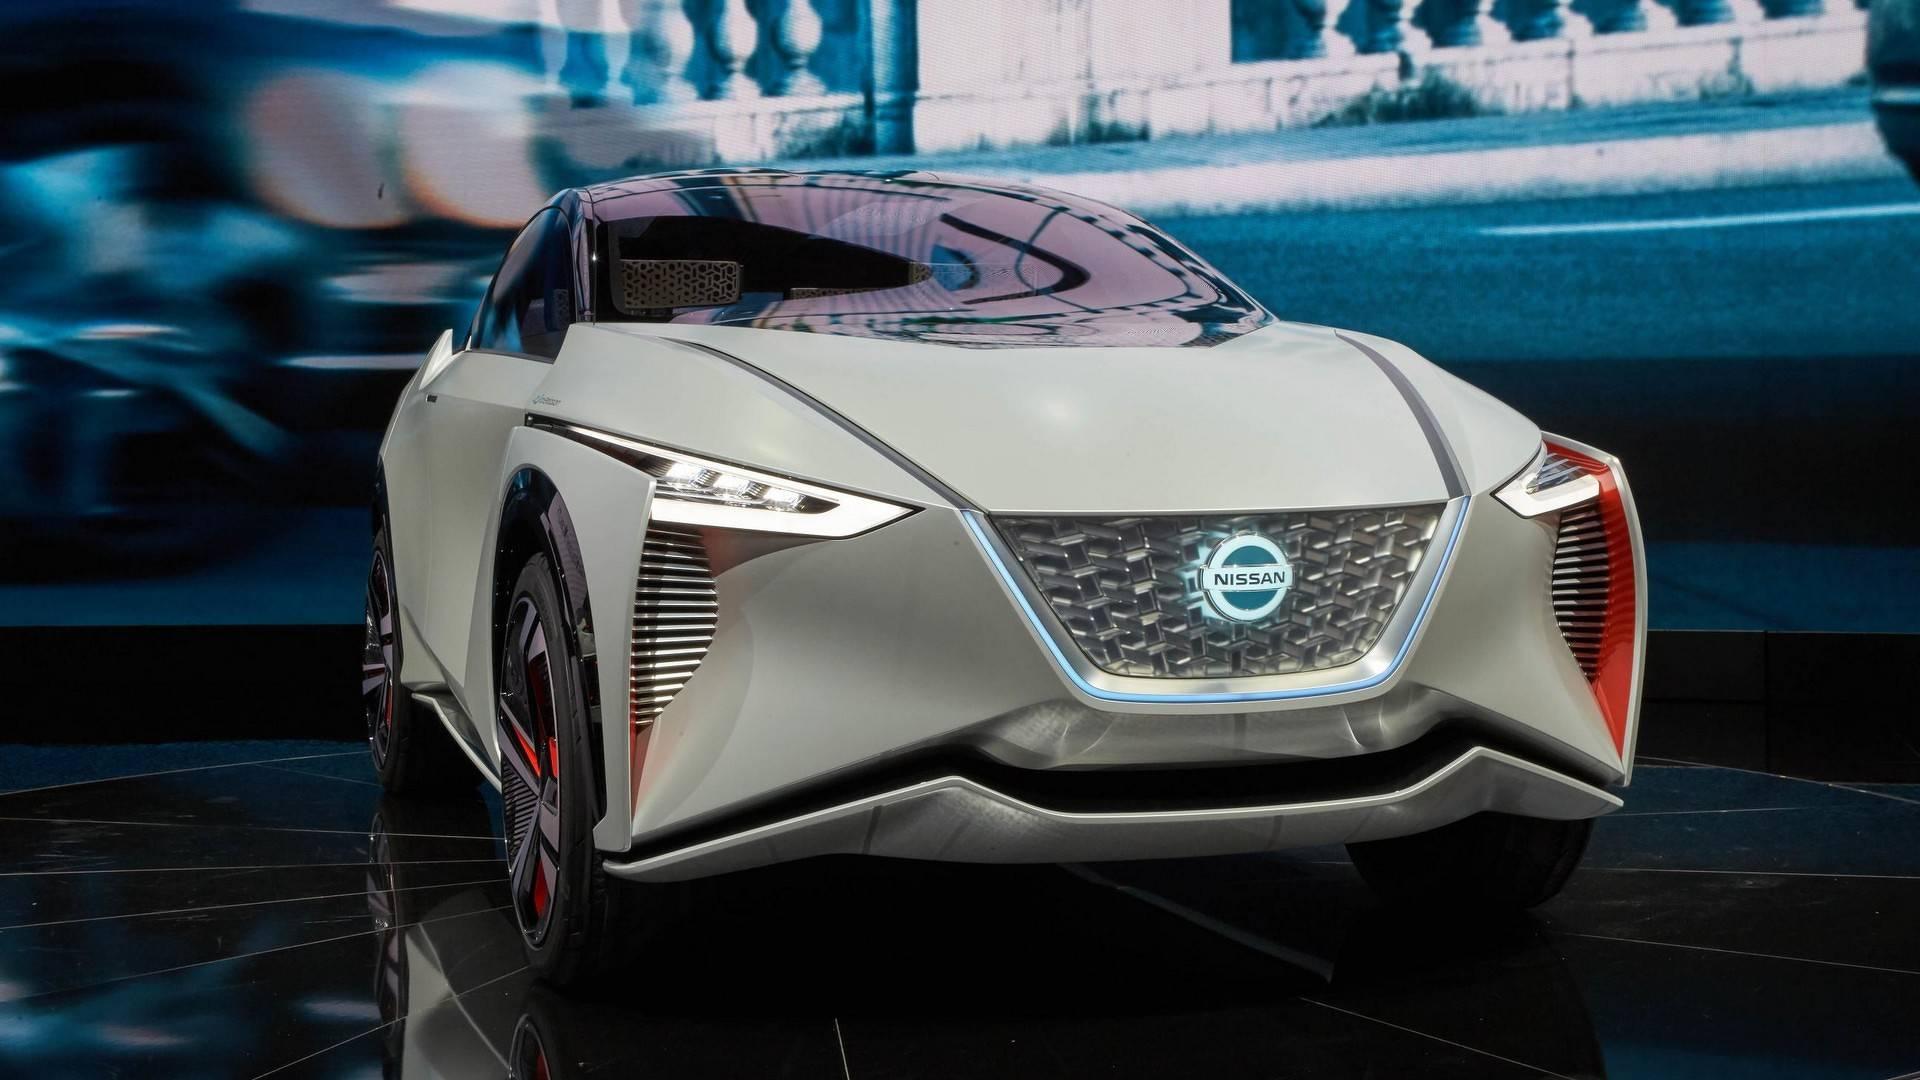 nissan imx concept نیسان IMX رونمایی شد   اجاره ماشین